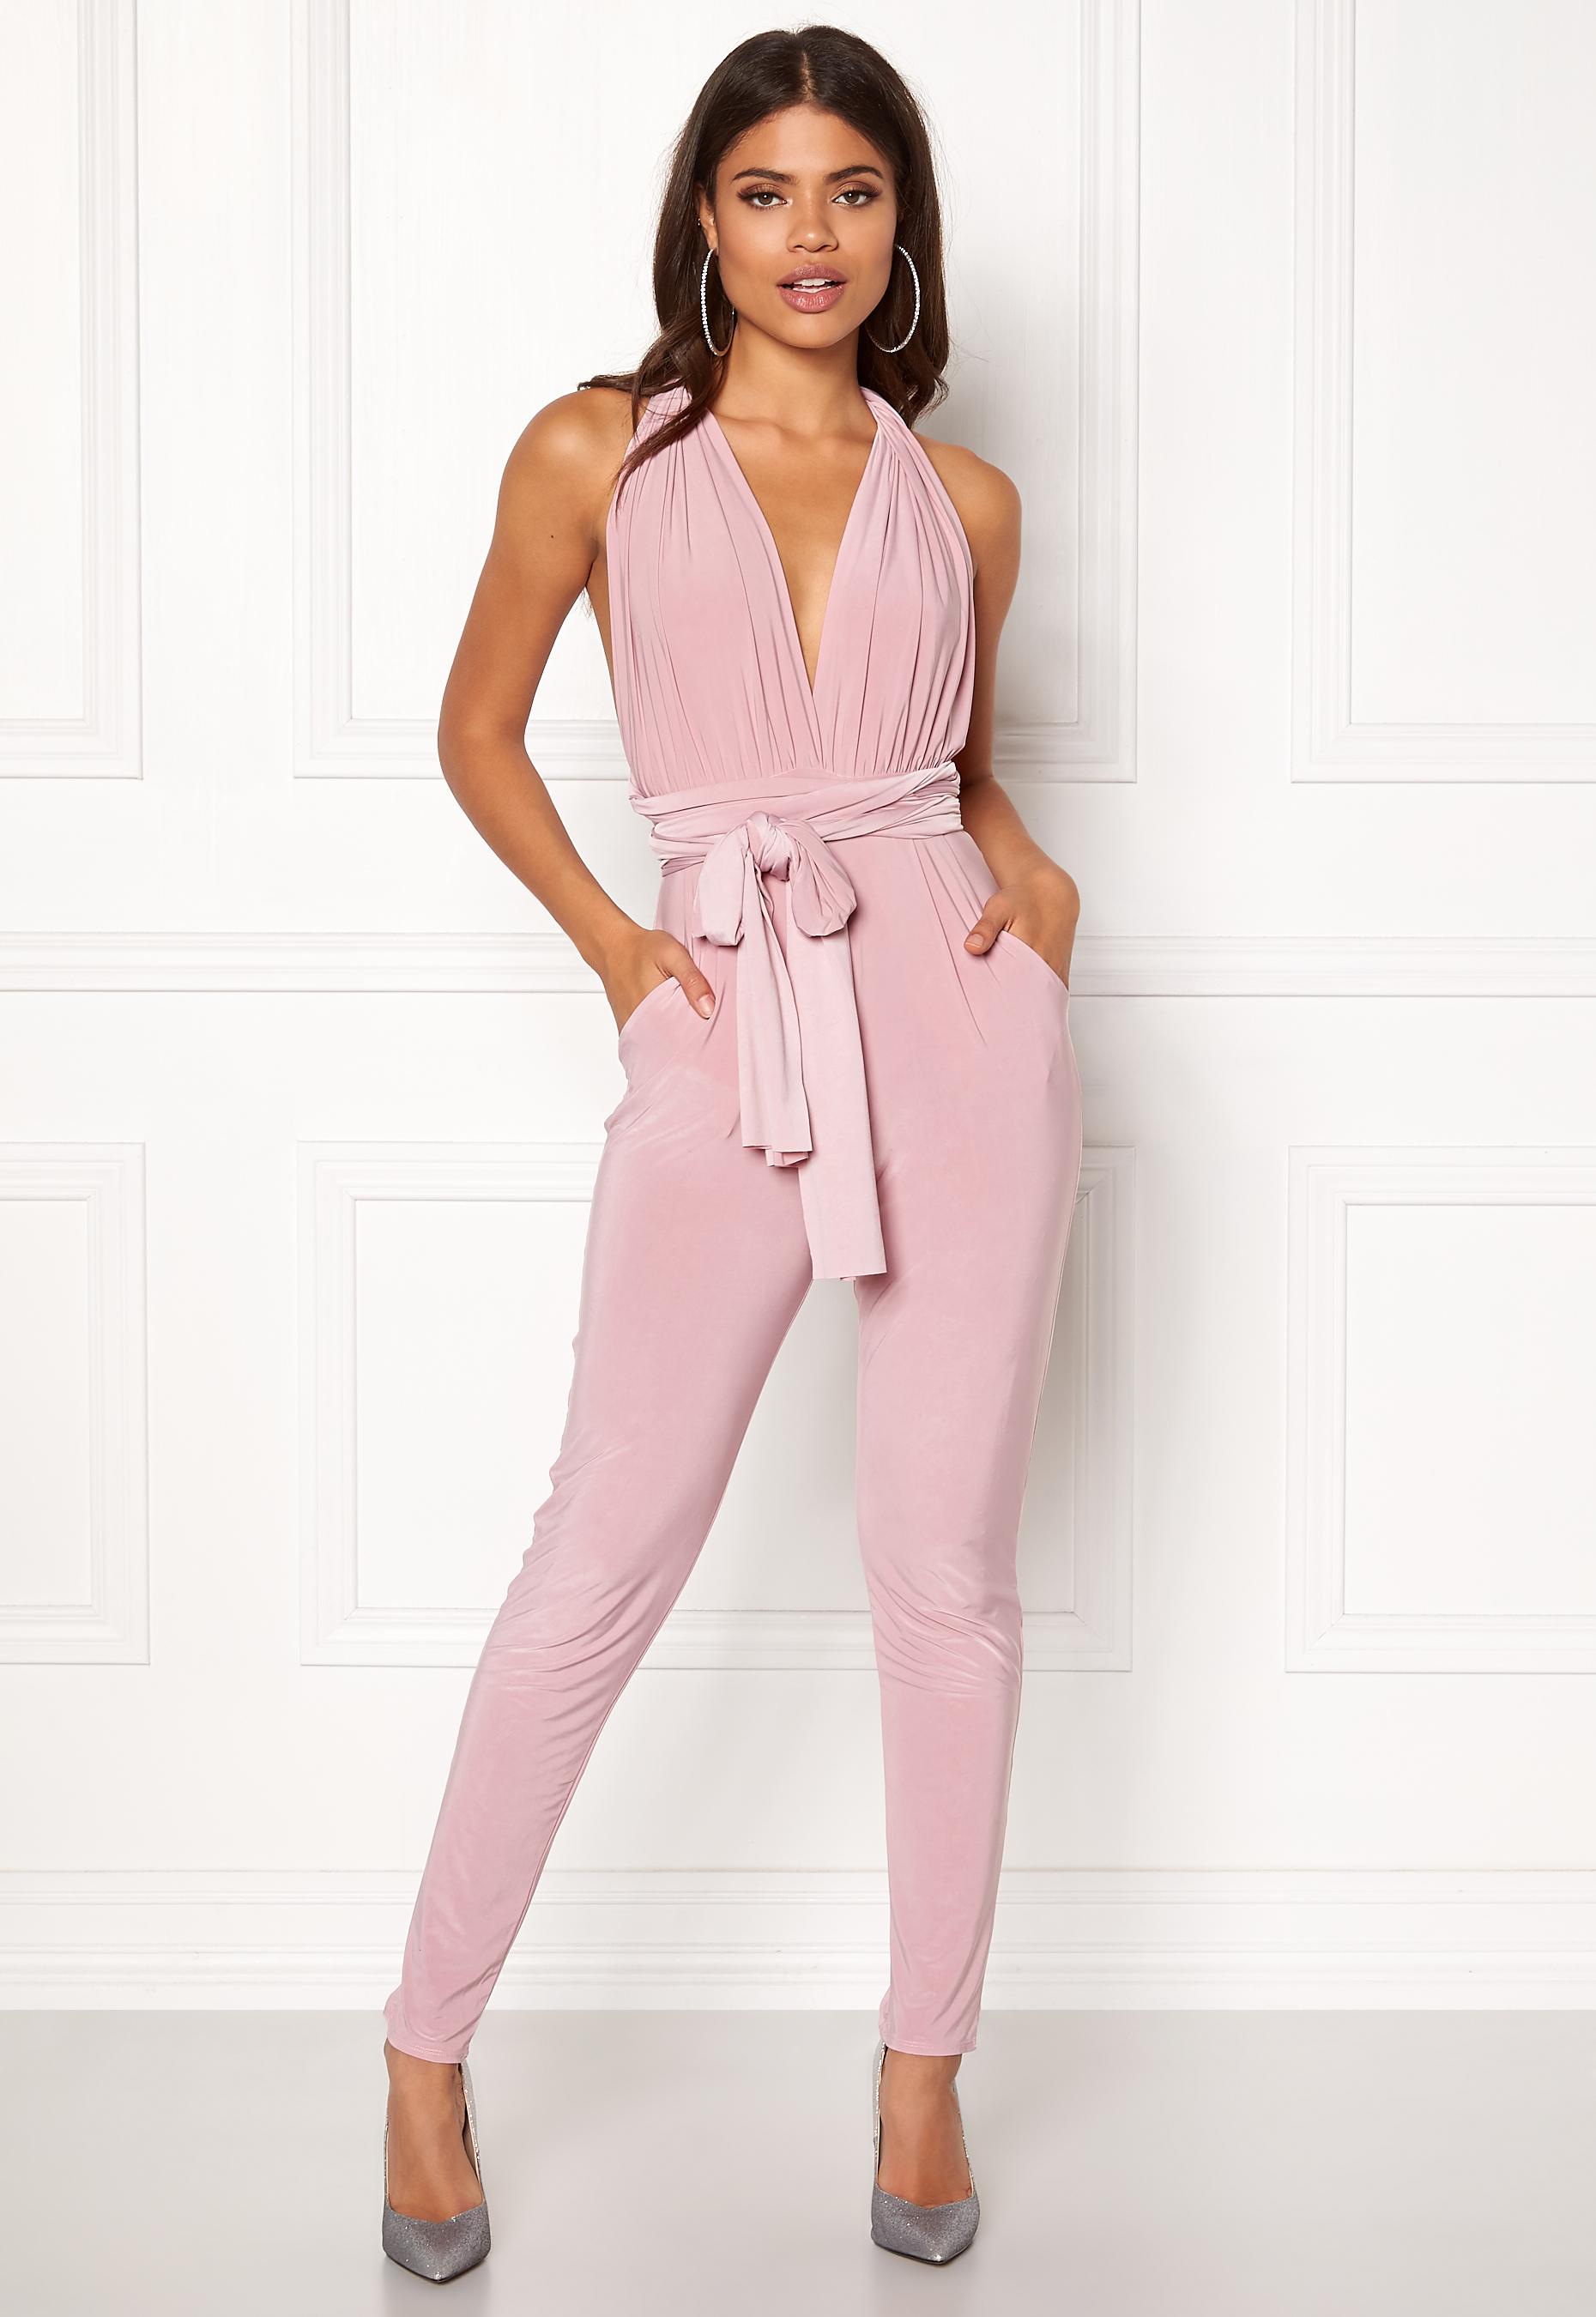 a8d5a2402c Fashion and dresses - Bubbleroom - Clothing   Shoes online